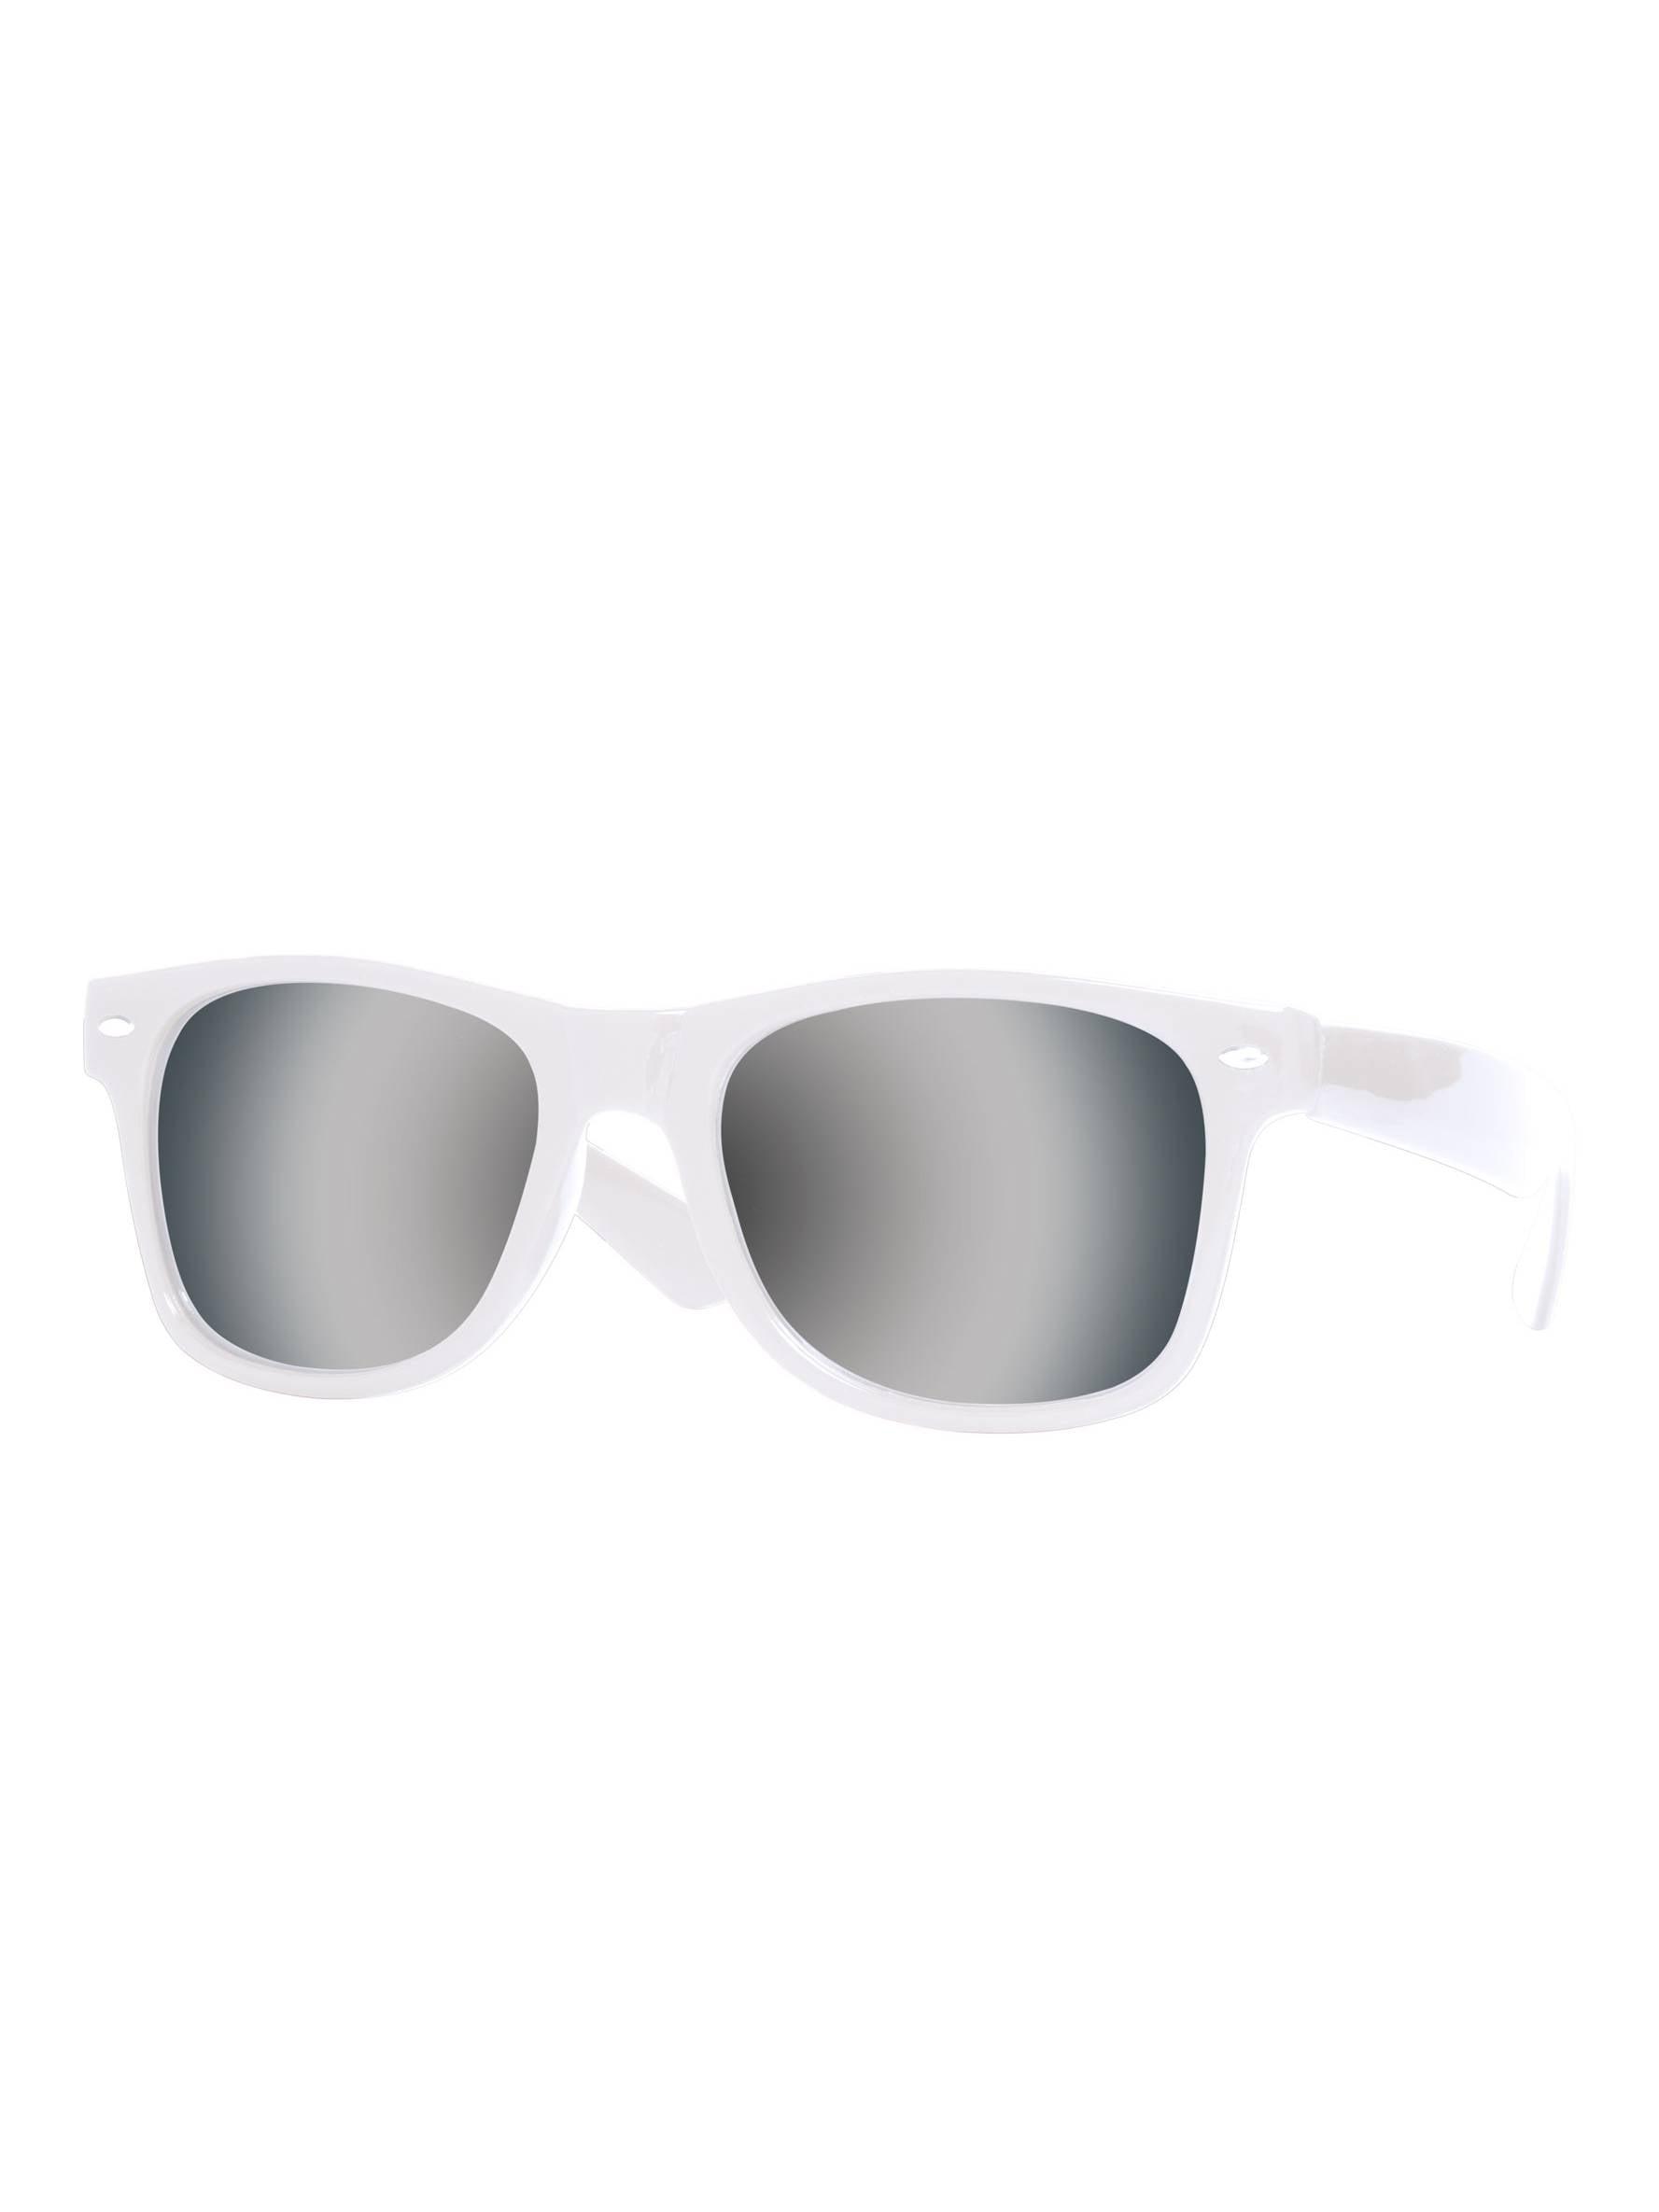 Gravity Shades Horn-Rimmed Mirror Sunglasses c4ecaf2a1